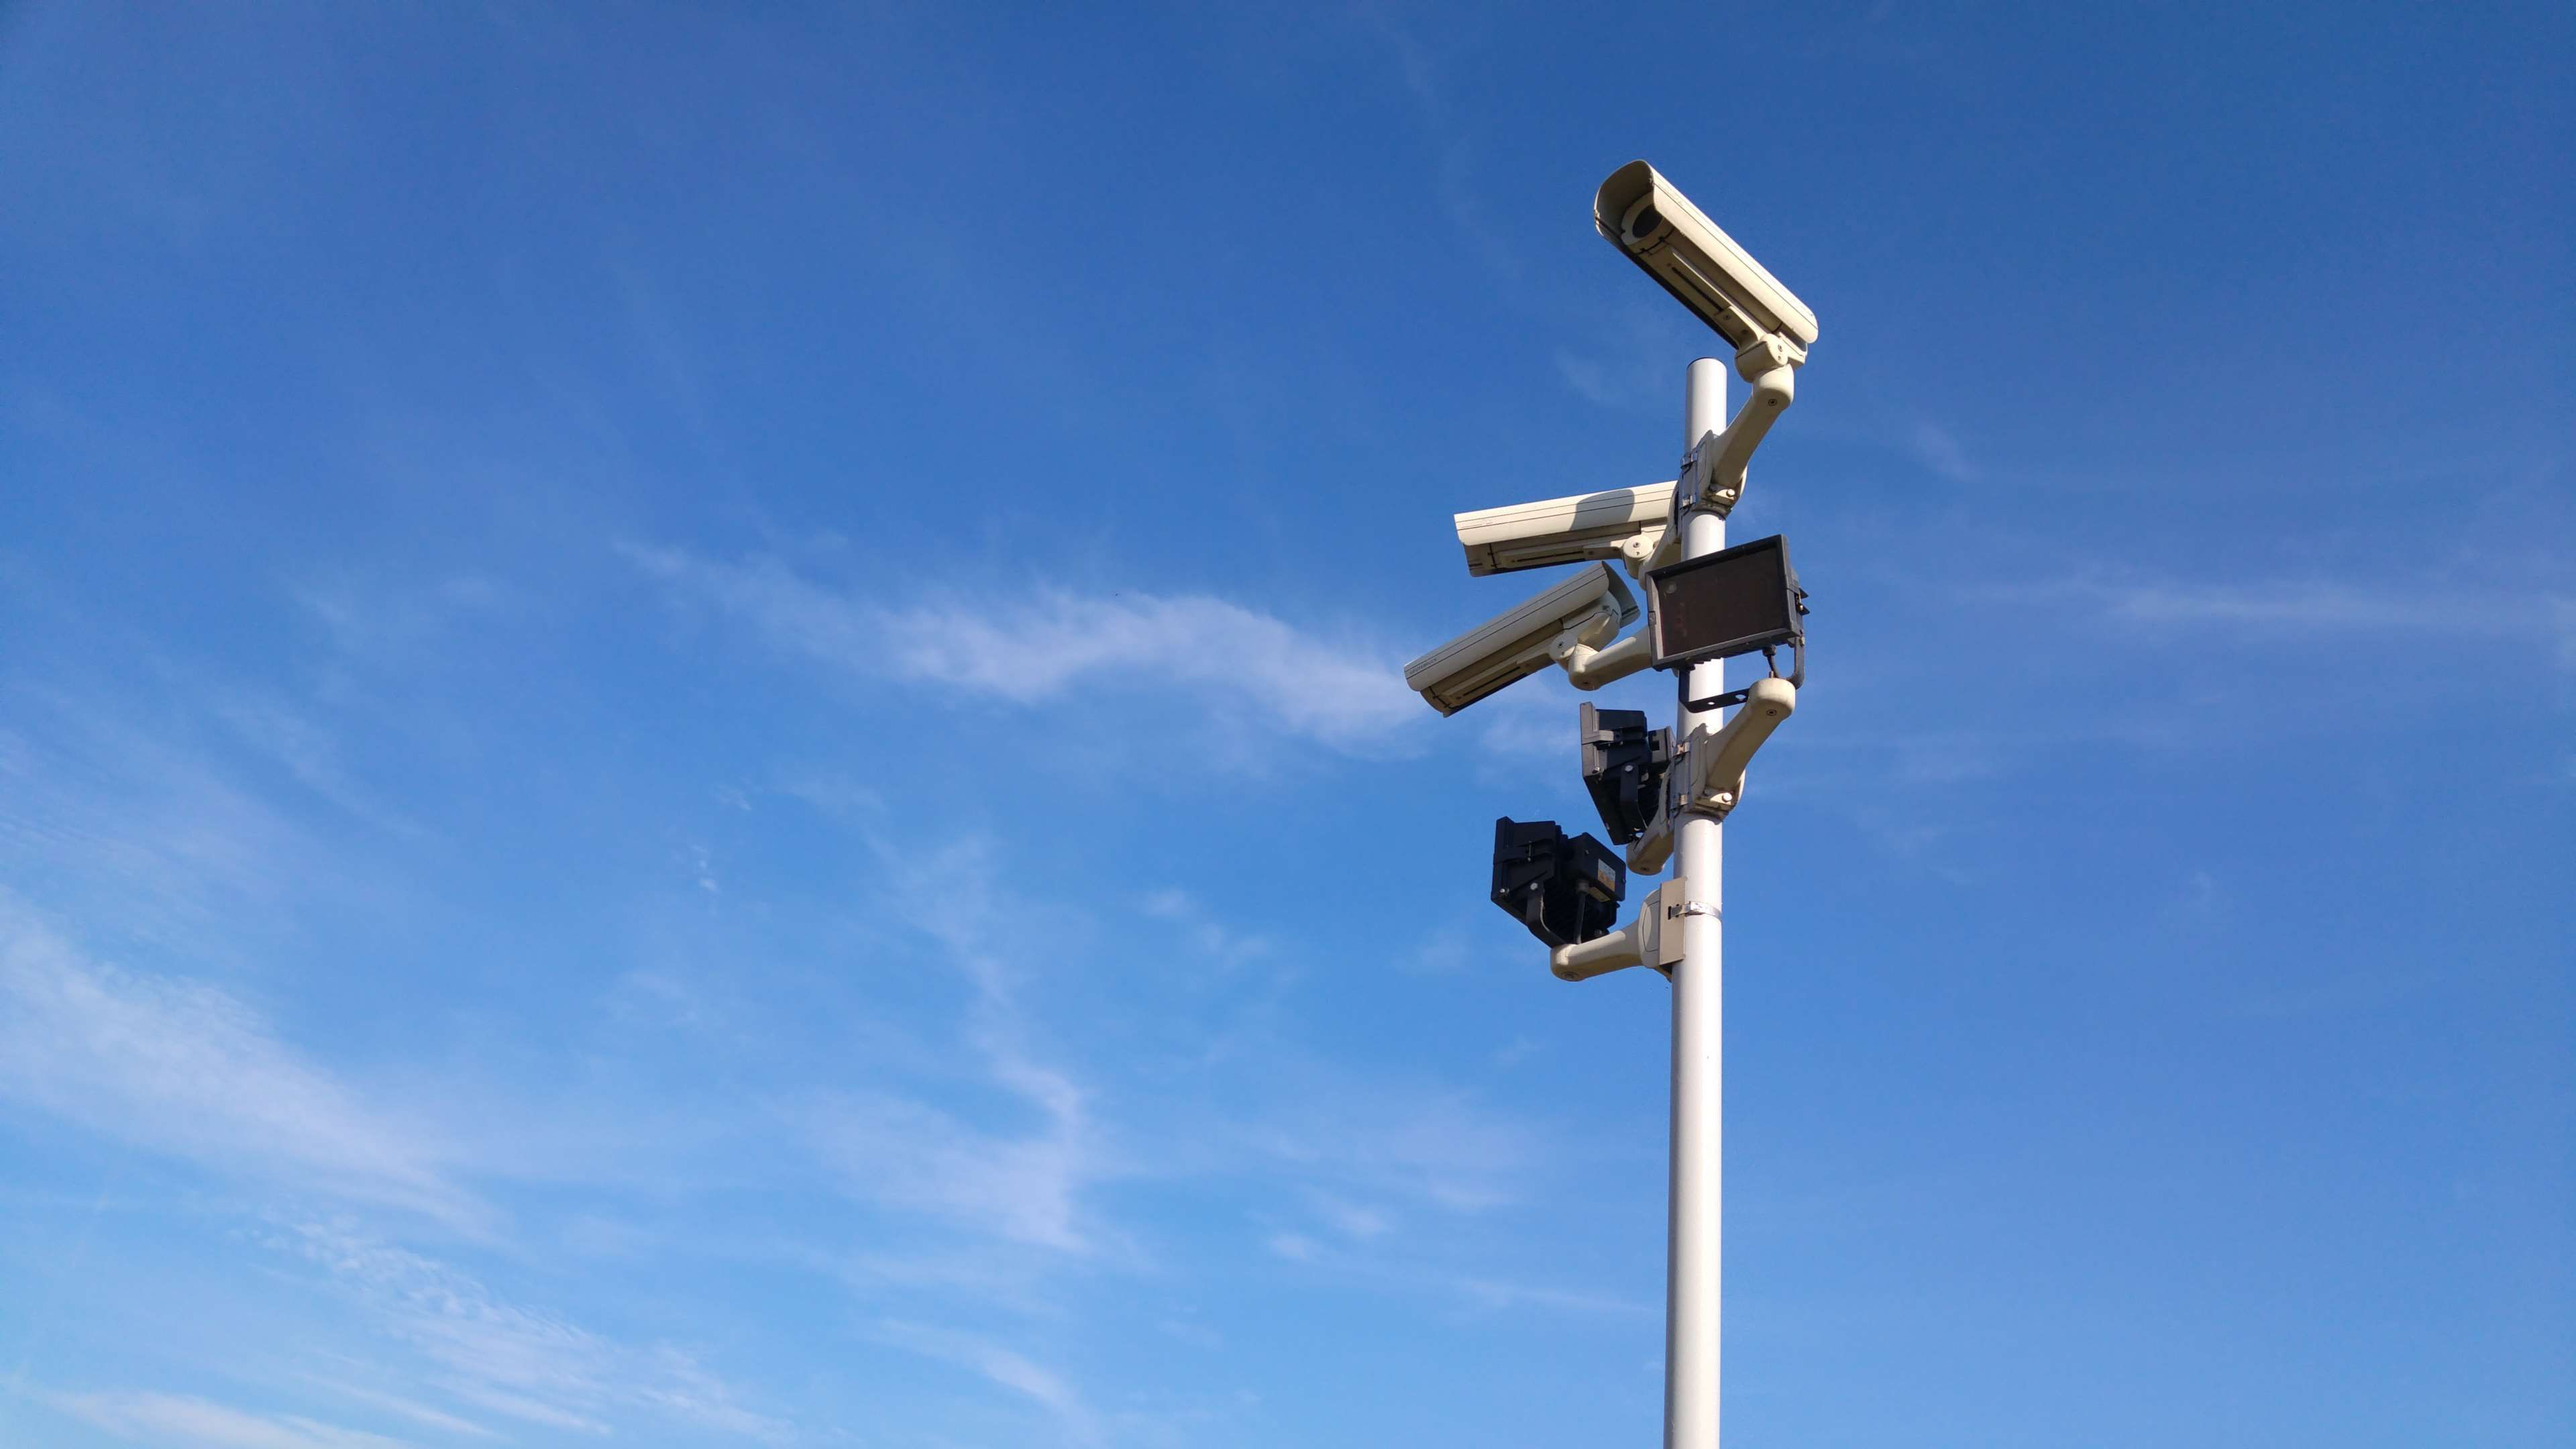 3840x2160 blue sky, camera, daylight, equipment, high